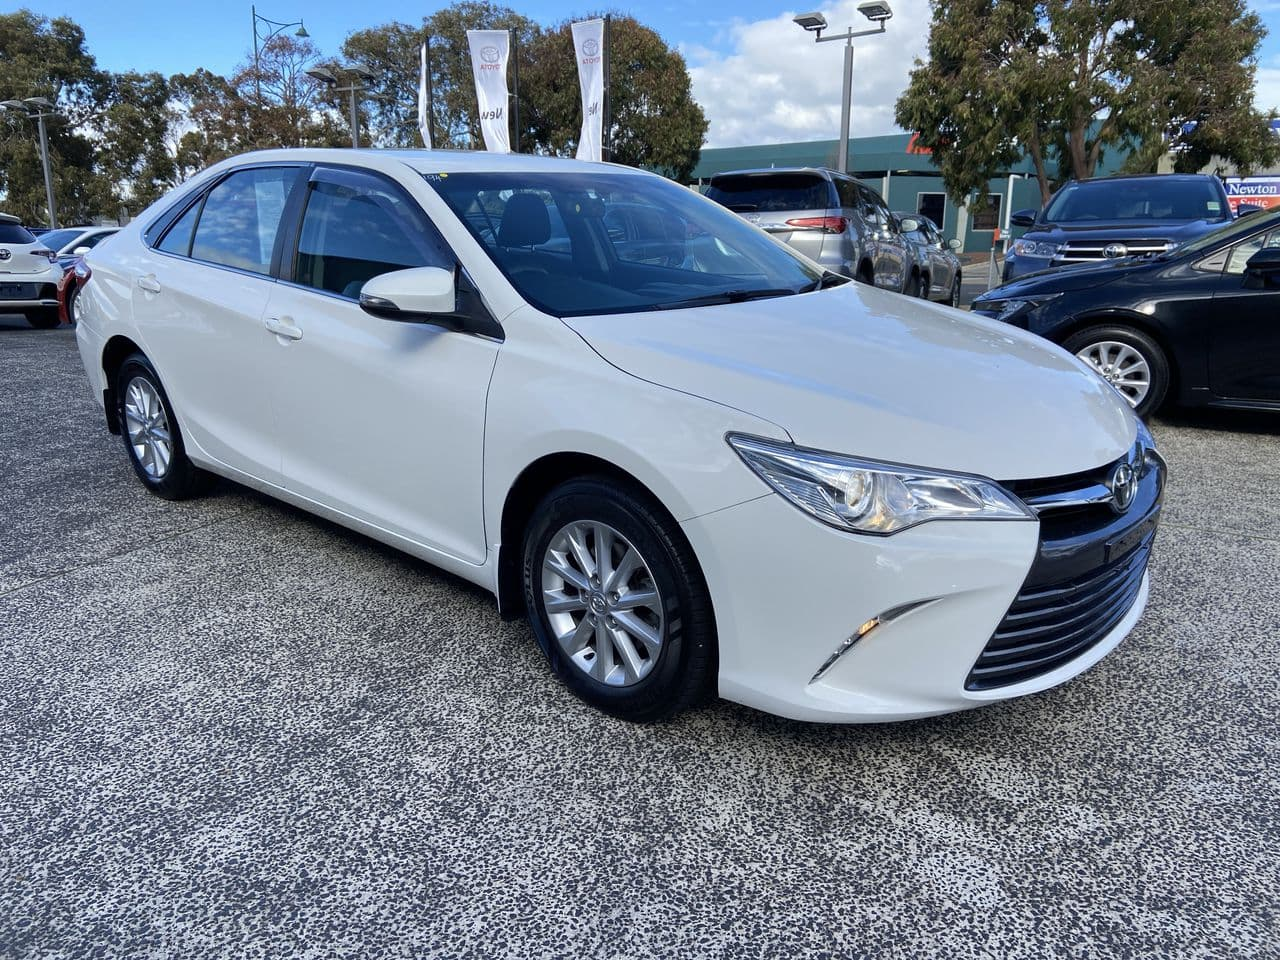 2017 Toyota Camry Altise Auto - image 1